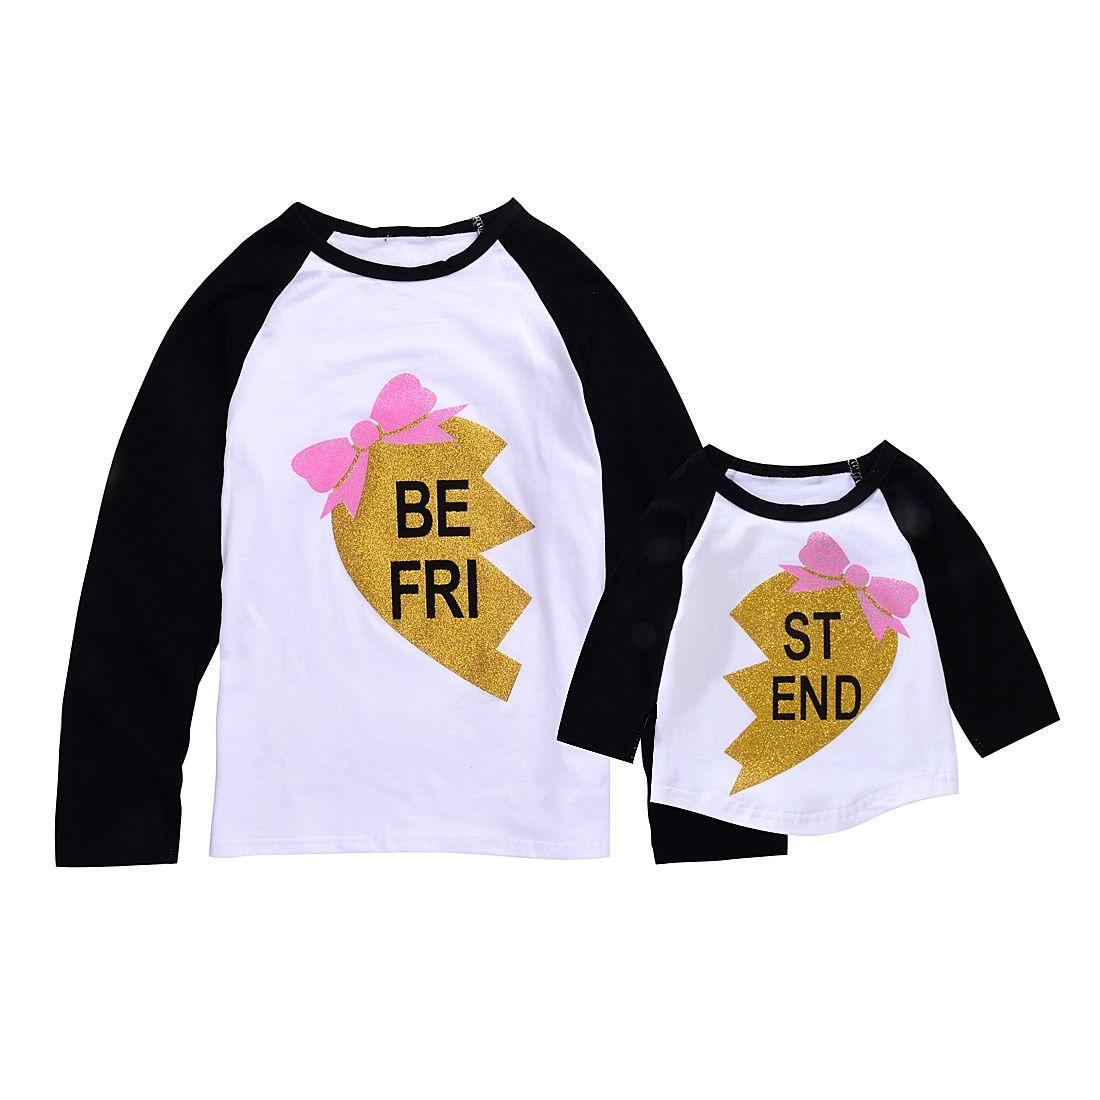 d824b2bc0561 Mikrdoo Best Friends Family T Shirt BE FRI ST END Letters Printed T ...